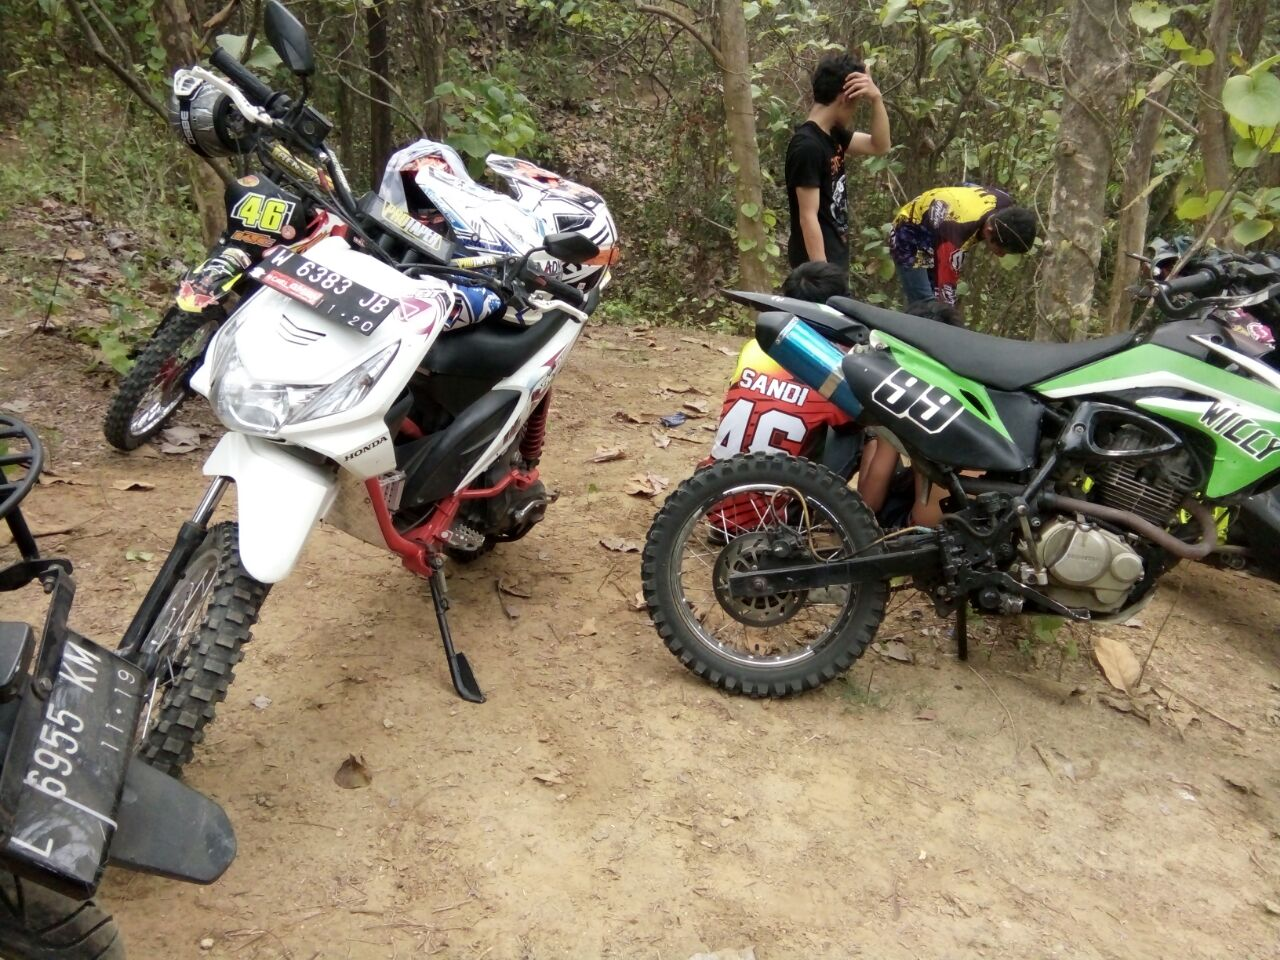 Cara Modif Honda Beat Jadi Trail Terlengkap Motor Cross